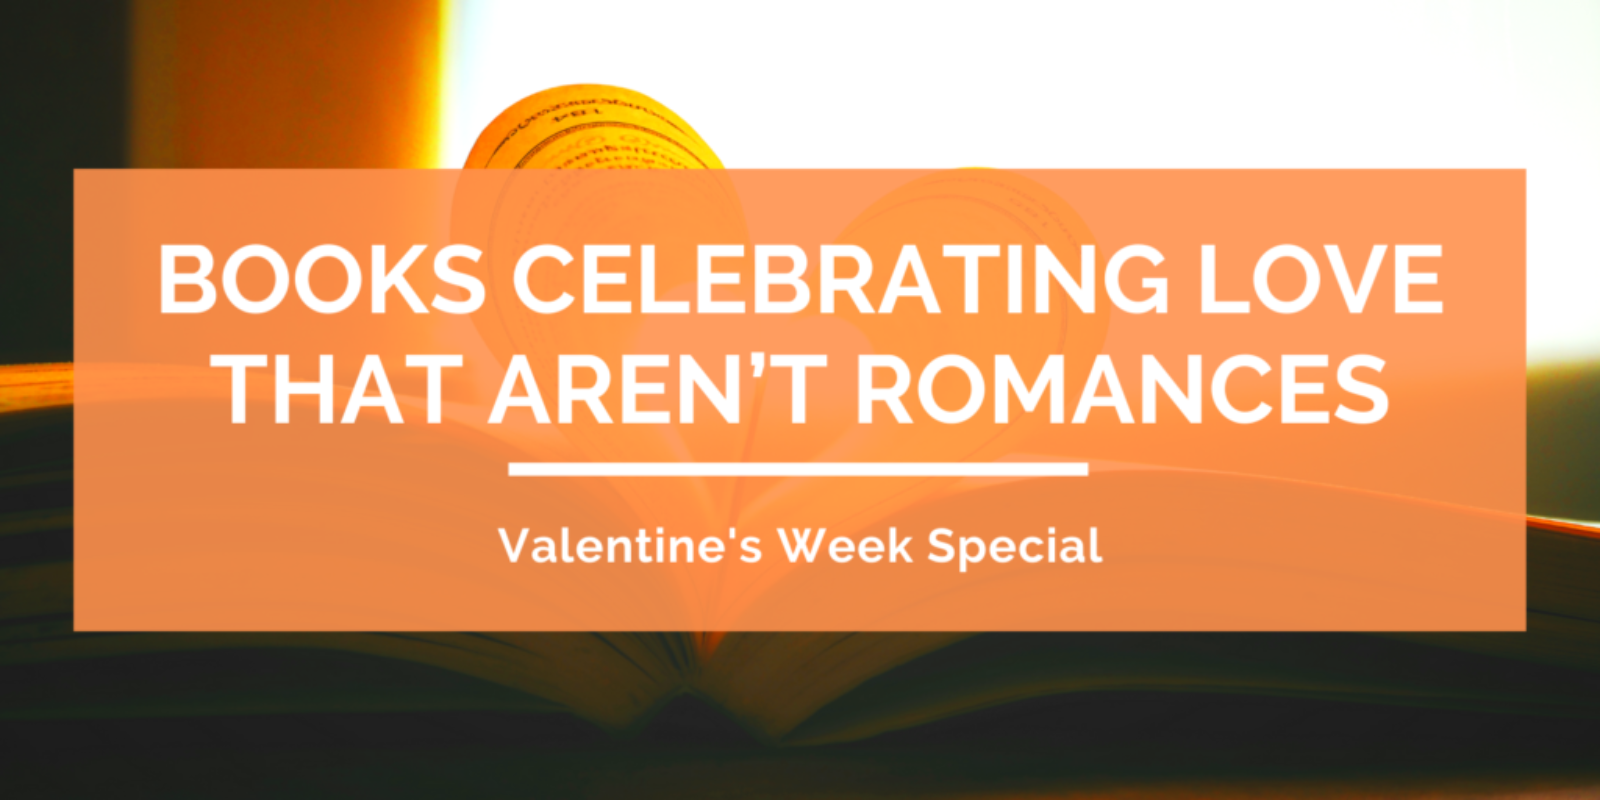 valentines-week-special-books-celebrating-love-that-arent-romances